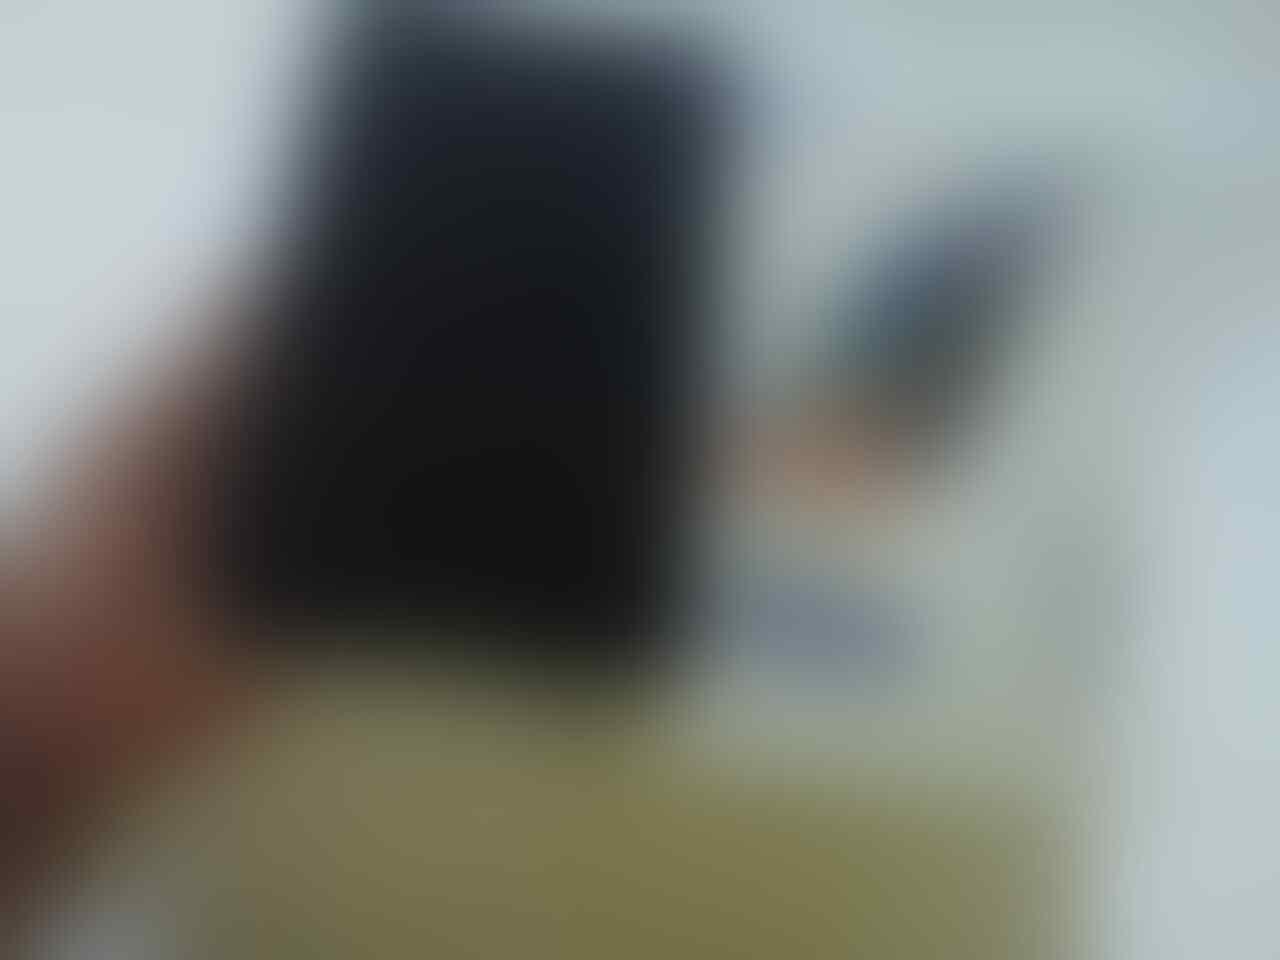 Samsung Galaxy TAb 7.0 plus P6200 android ICS msh grs desember 2013